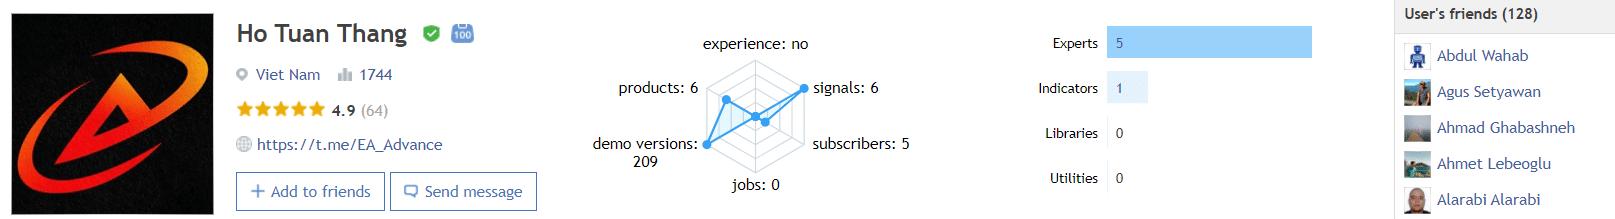 Advanced Hedge profile